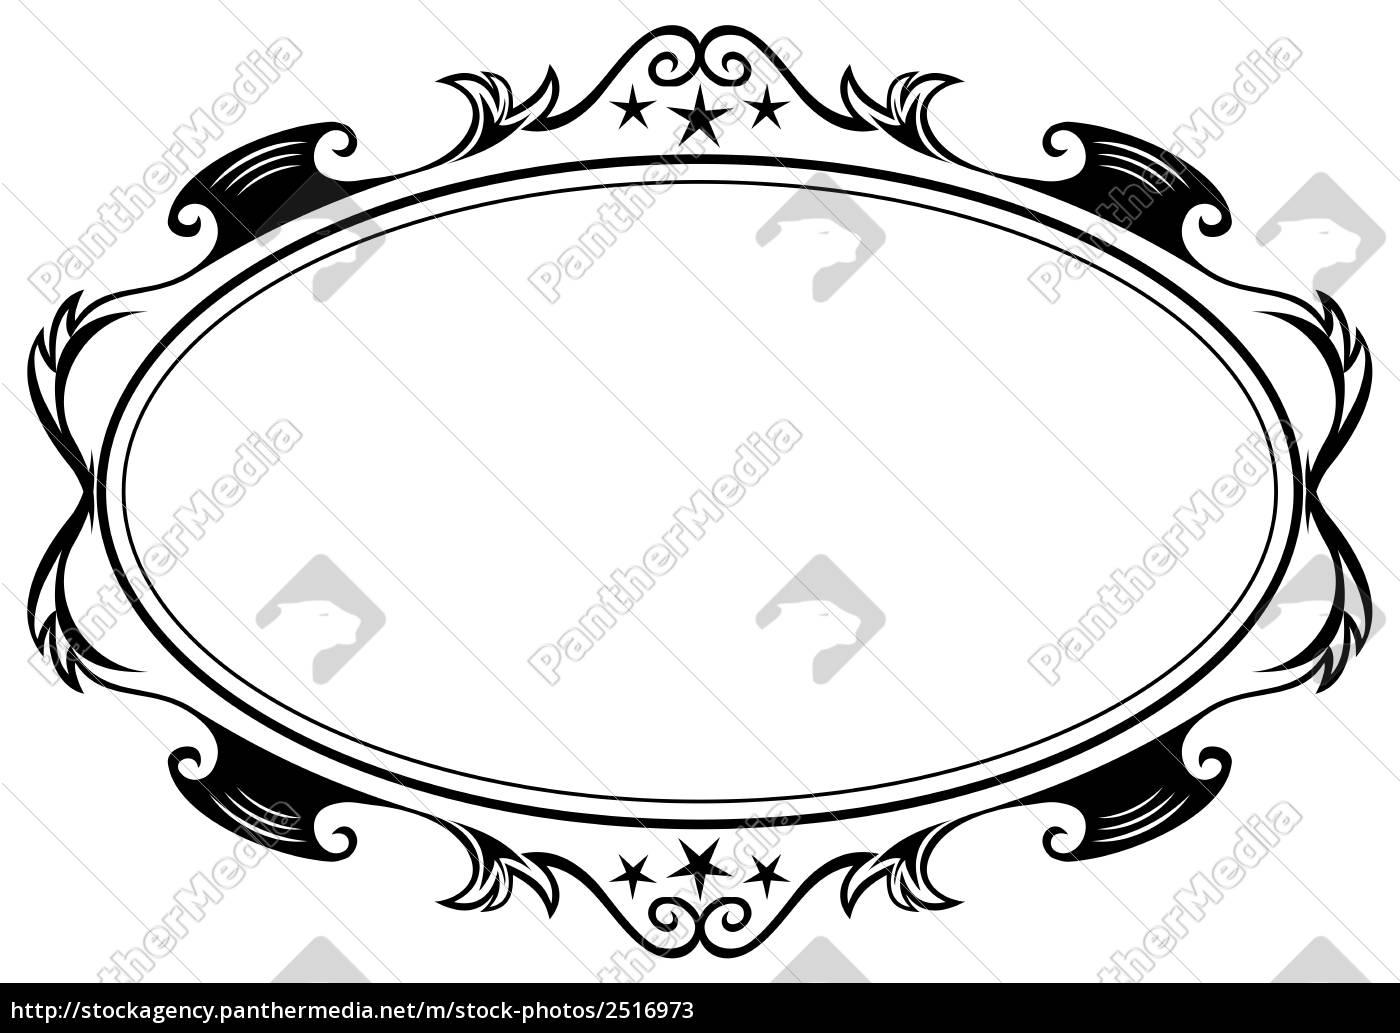 antique ovalen rahmen - Stockfoto - #2516973 - Bildagentur PantherMedia